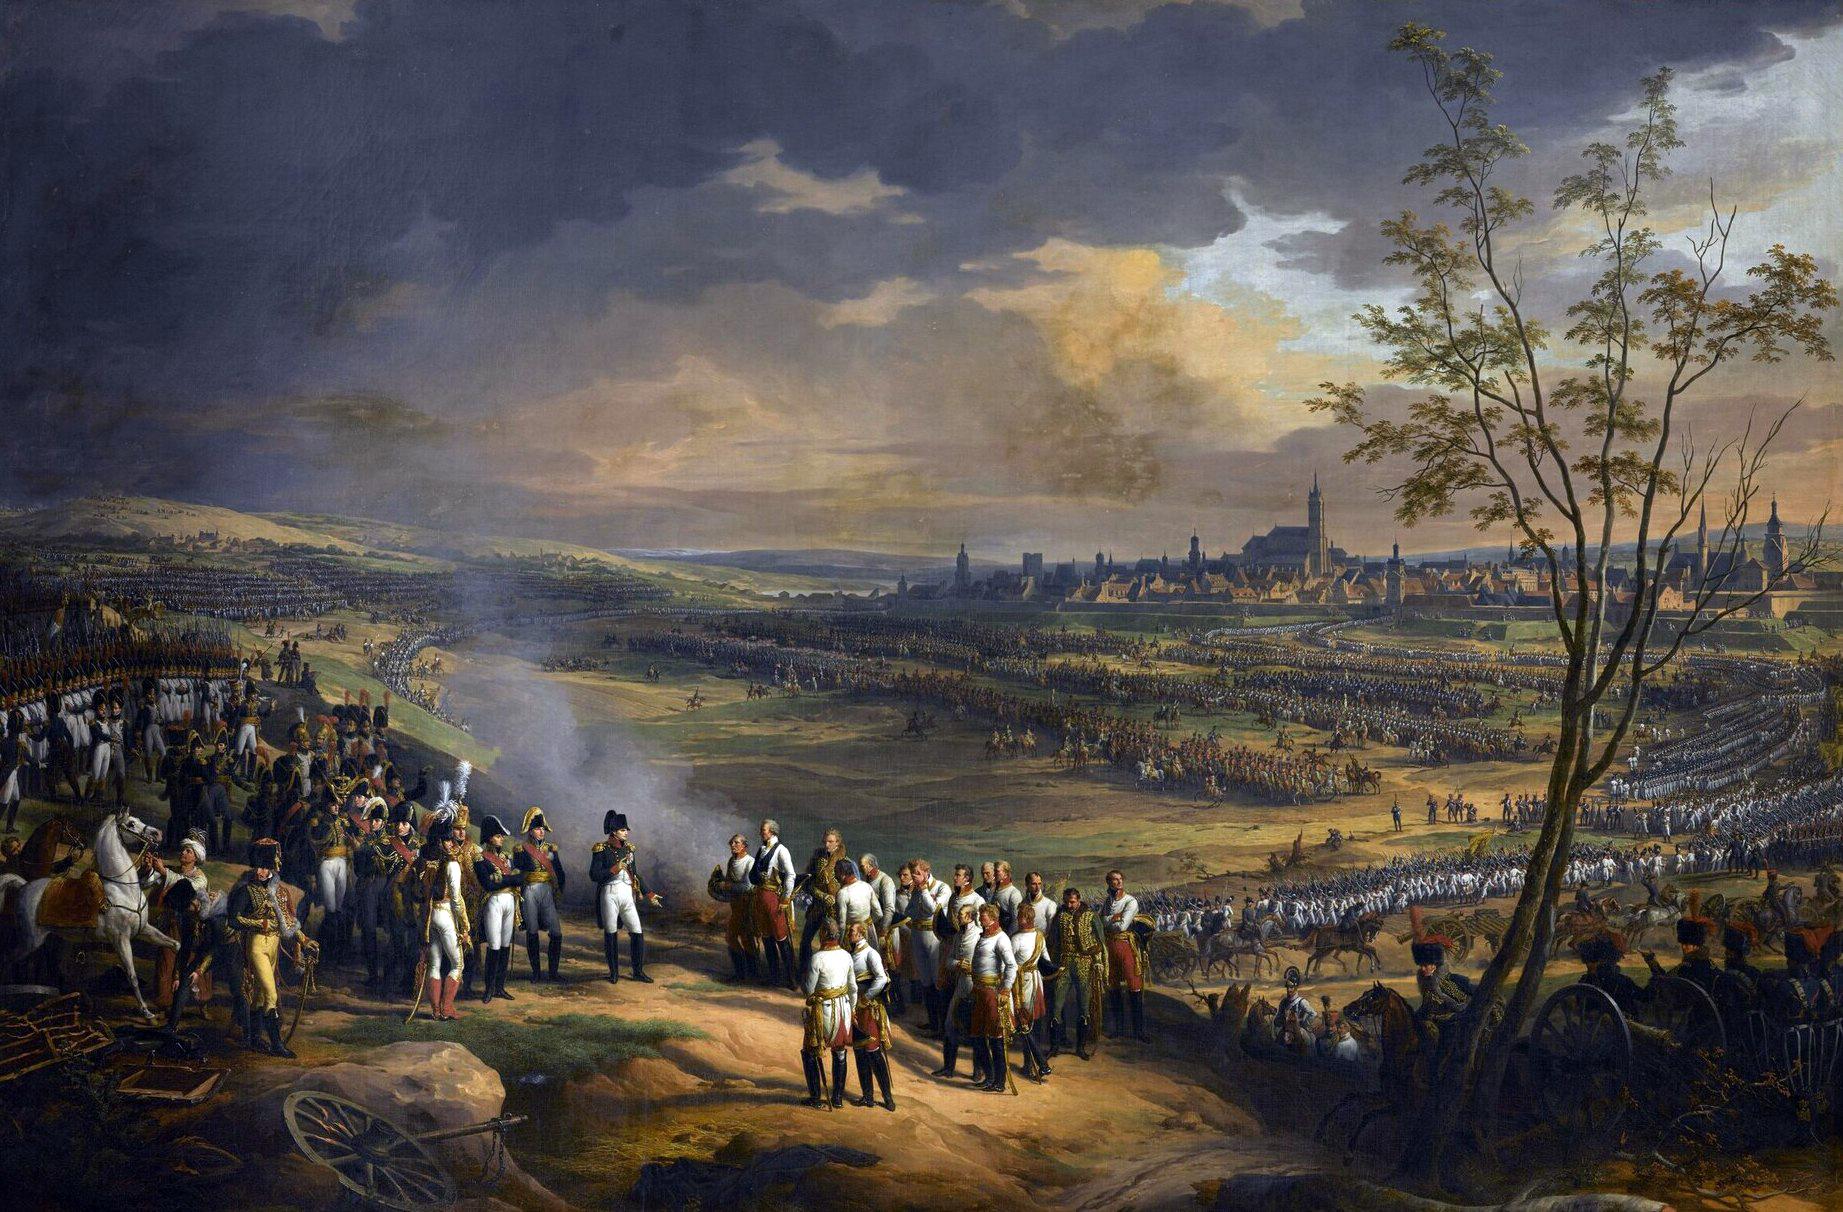 Batalla de Ulm - Wikipedia, la enciclopedia libre